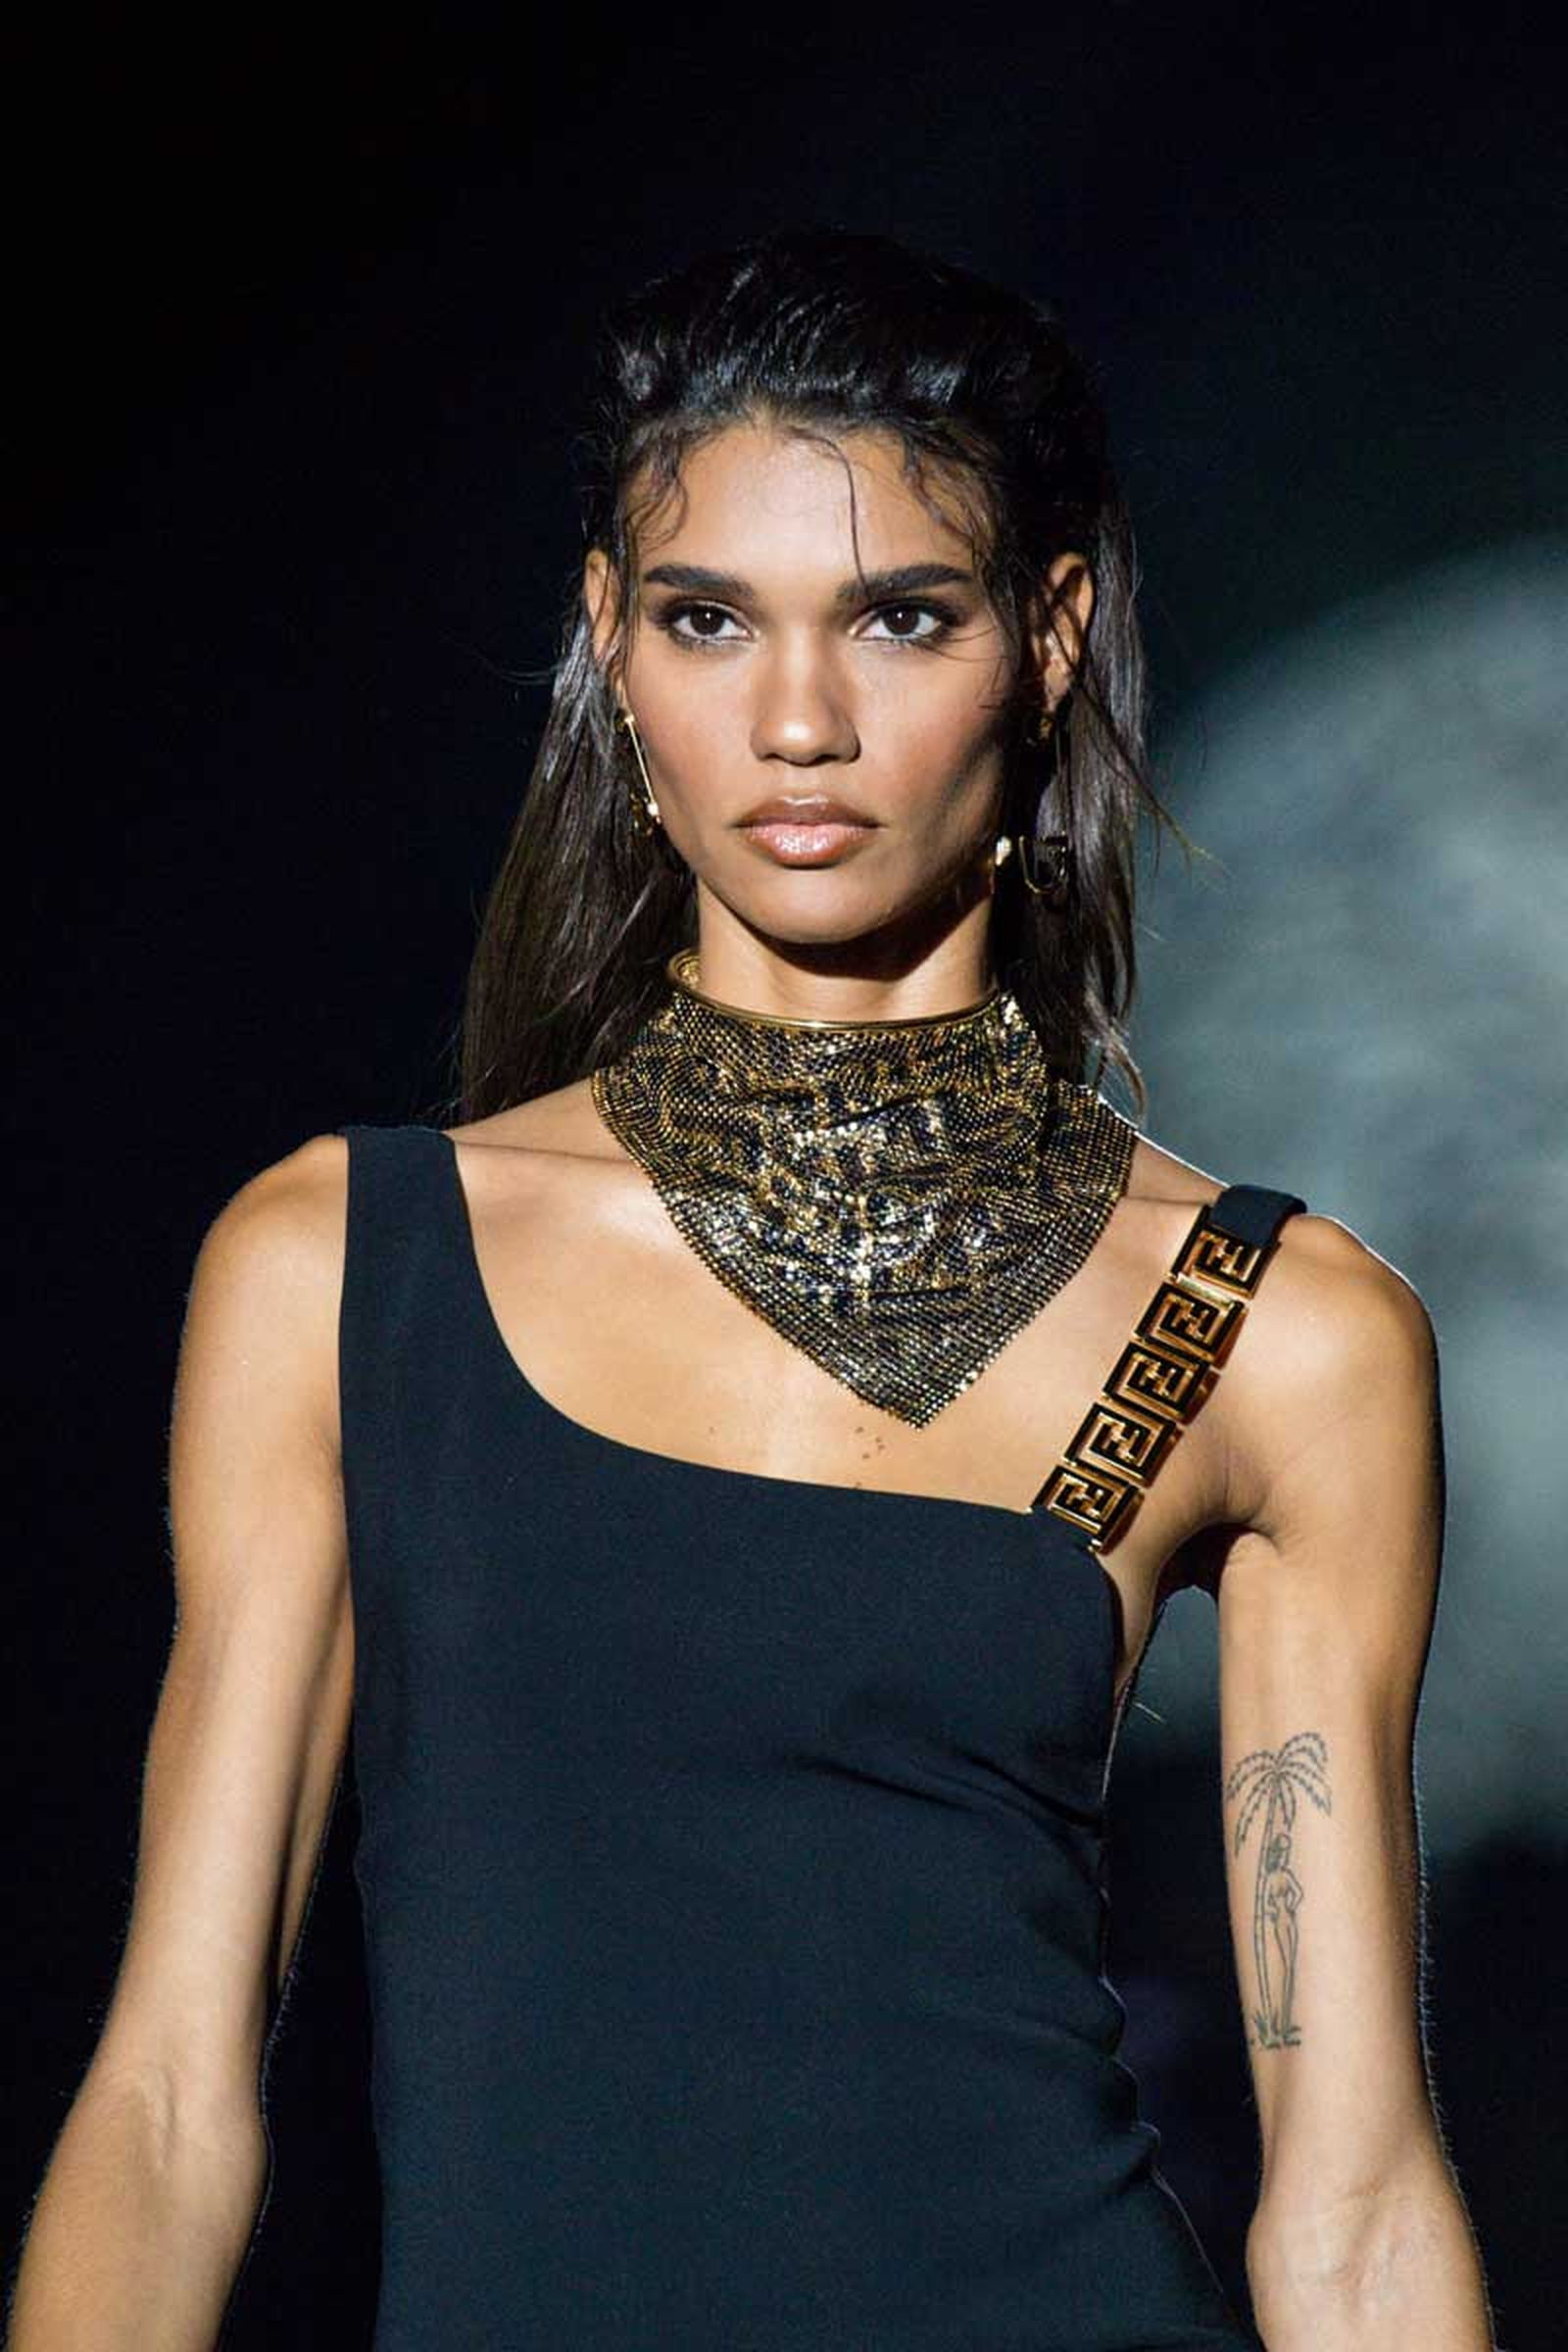 versace-fendi-collab--(49)